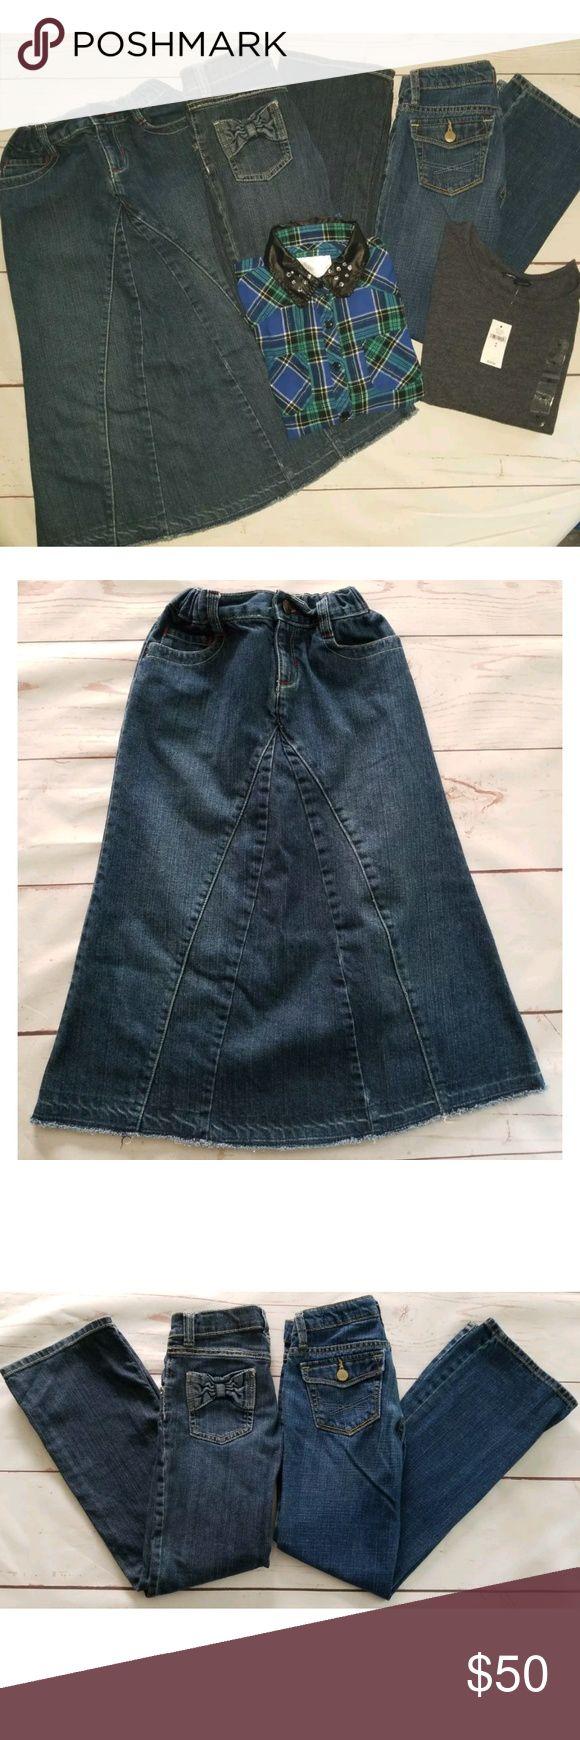 Sz 8 Girls 5 Piece Lot Jeans, Shirts & Skirt 5 Piece Lot Jeans, Shirts & Skirt  One NEW WITH TAG!  Gap Kids Boot Cut Jeans, Dark Wash, Adjustable Waist, 100% Cotton, Size 8   Gymboree Boot Cut Jeans, Dark Wash, Adjustable Waist, Cotton Blend, Size 8  Gap Kids Long Denim Skirt, Dark Wash, Mid Calf, Adjustable Waist, 100% Cotton, Size 8  Gap Kids Gray, Long Sleeve, Crew Neck, Tee Shirt, Cotton Blend, Size Medium 8 NWT  Justice Blue, Green & Black Plaid, Long Convertible Sleeve Shirt/Blouse…